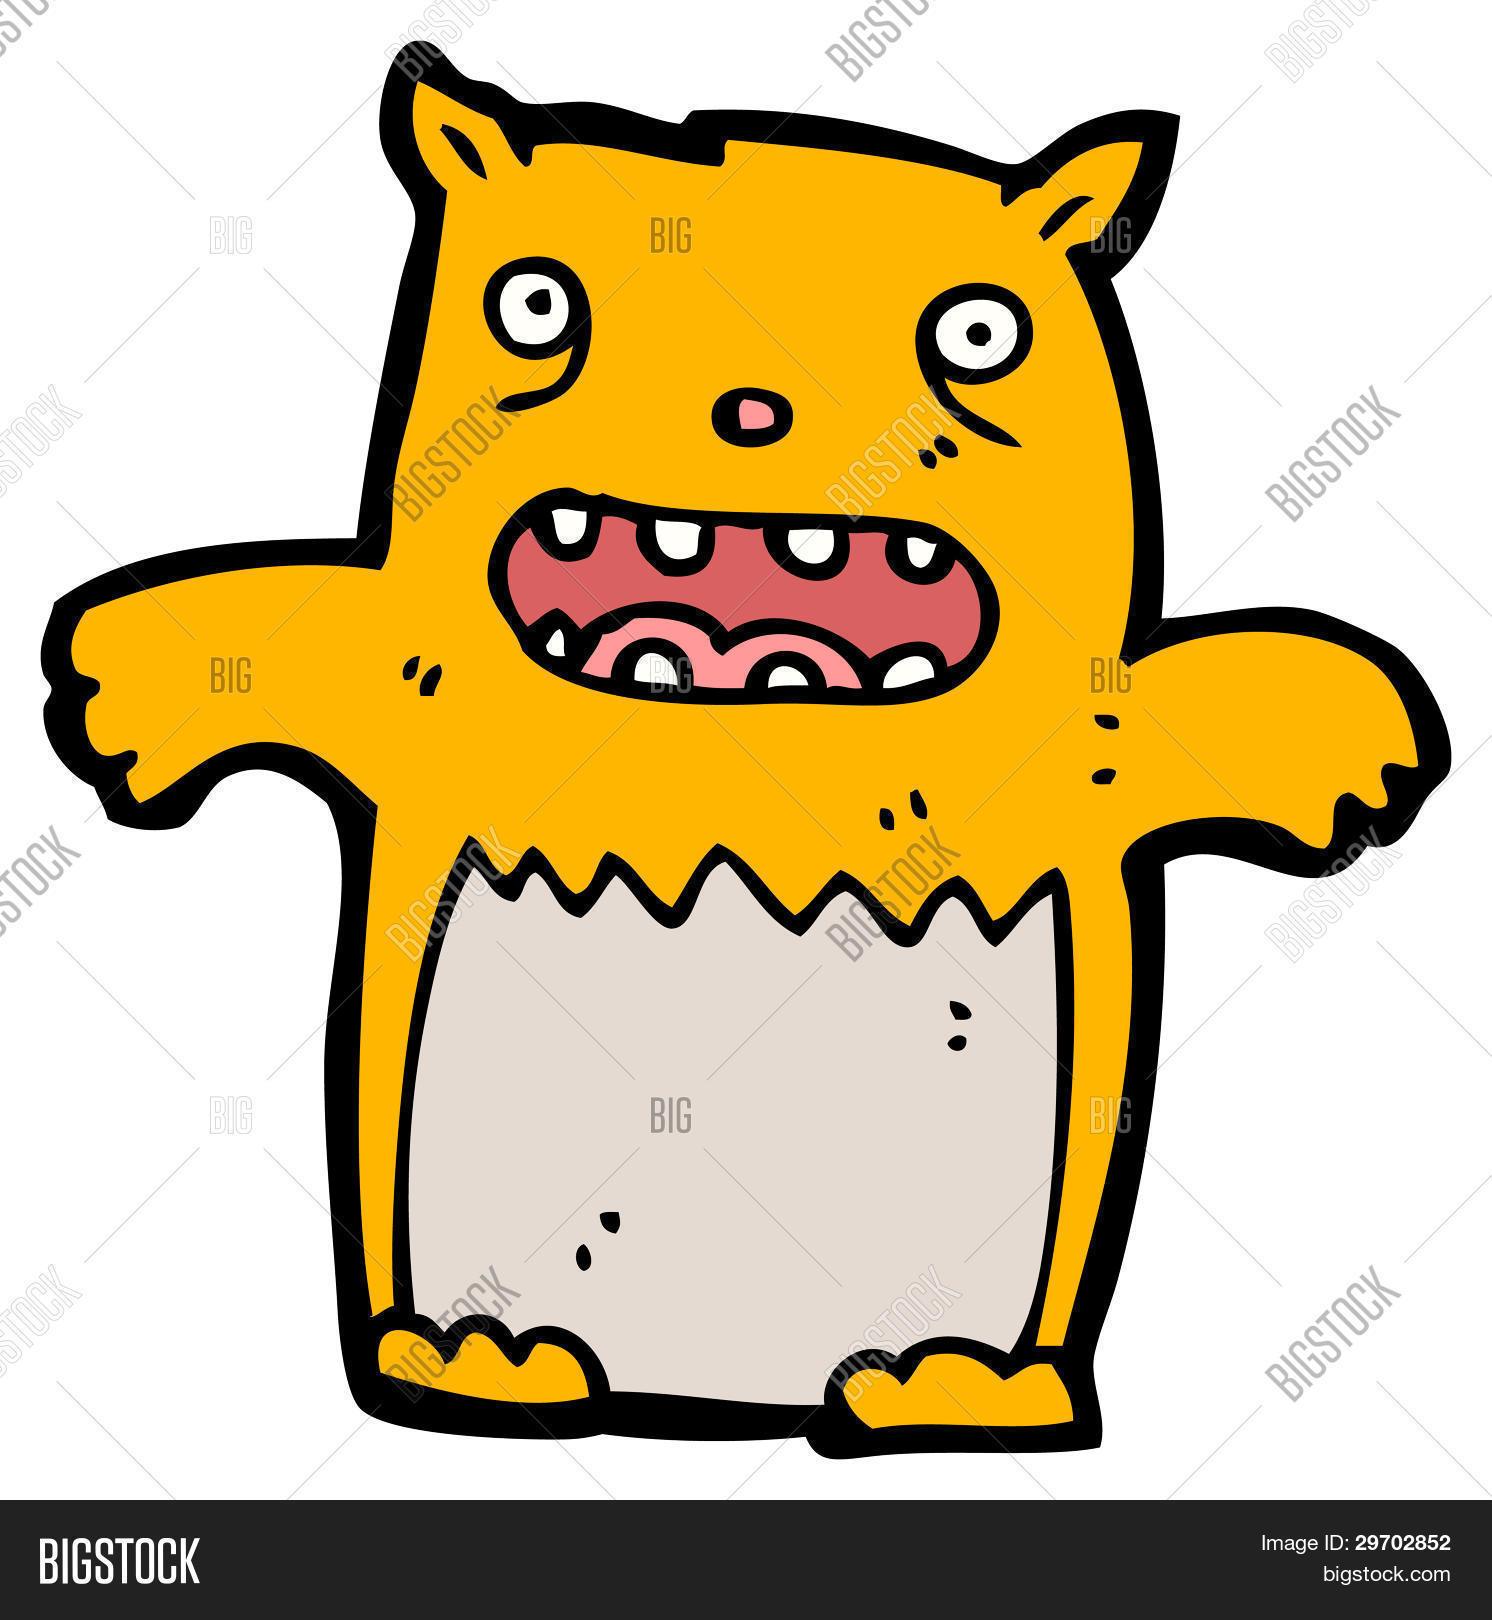 Ugly Cartoon Cat Image Photo Free Trial Bigstock